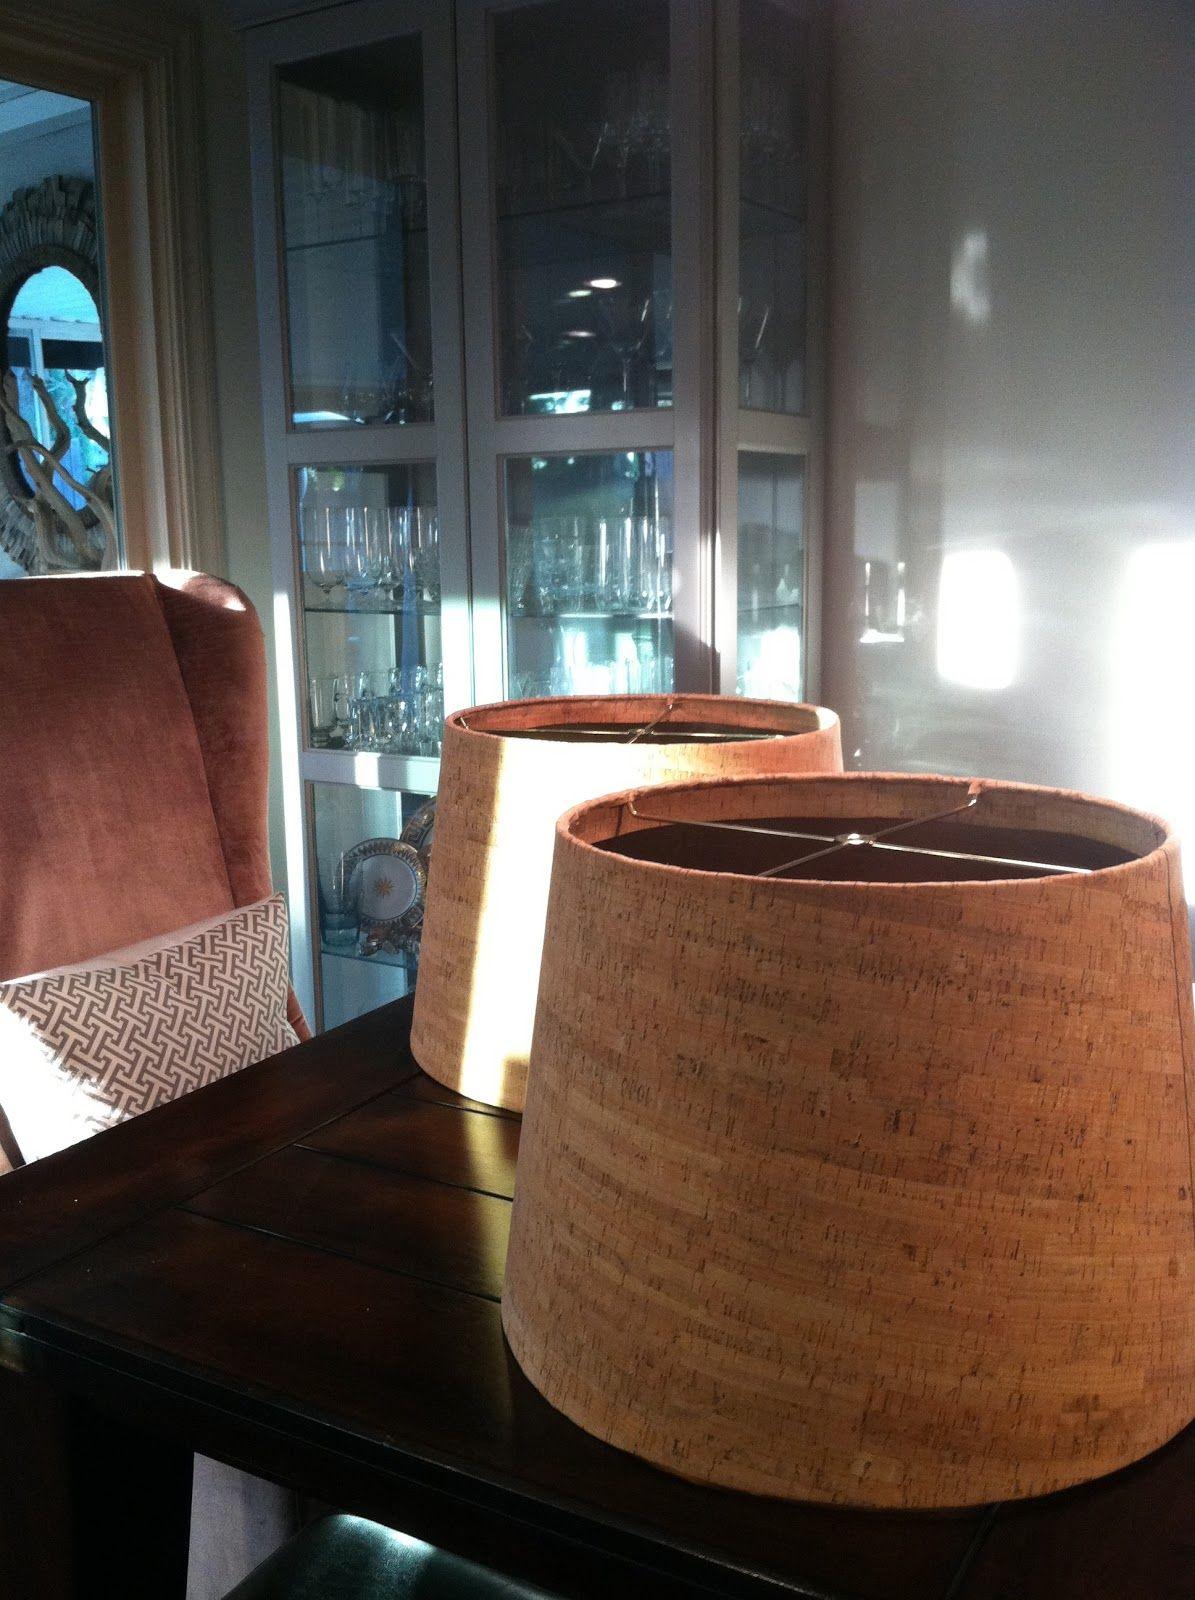 The reveal cork fabric lampshade cork fabric fabric the reveal cork fabric lampshade aloadofball Choice Image